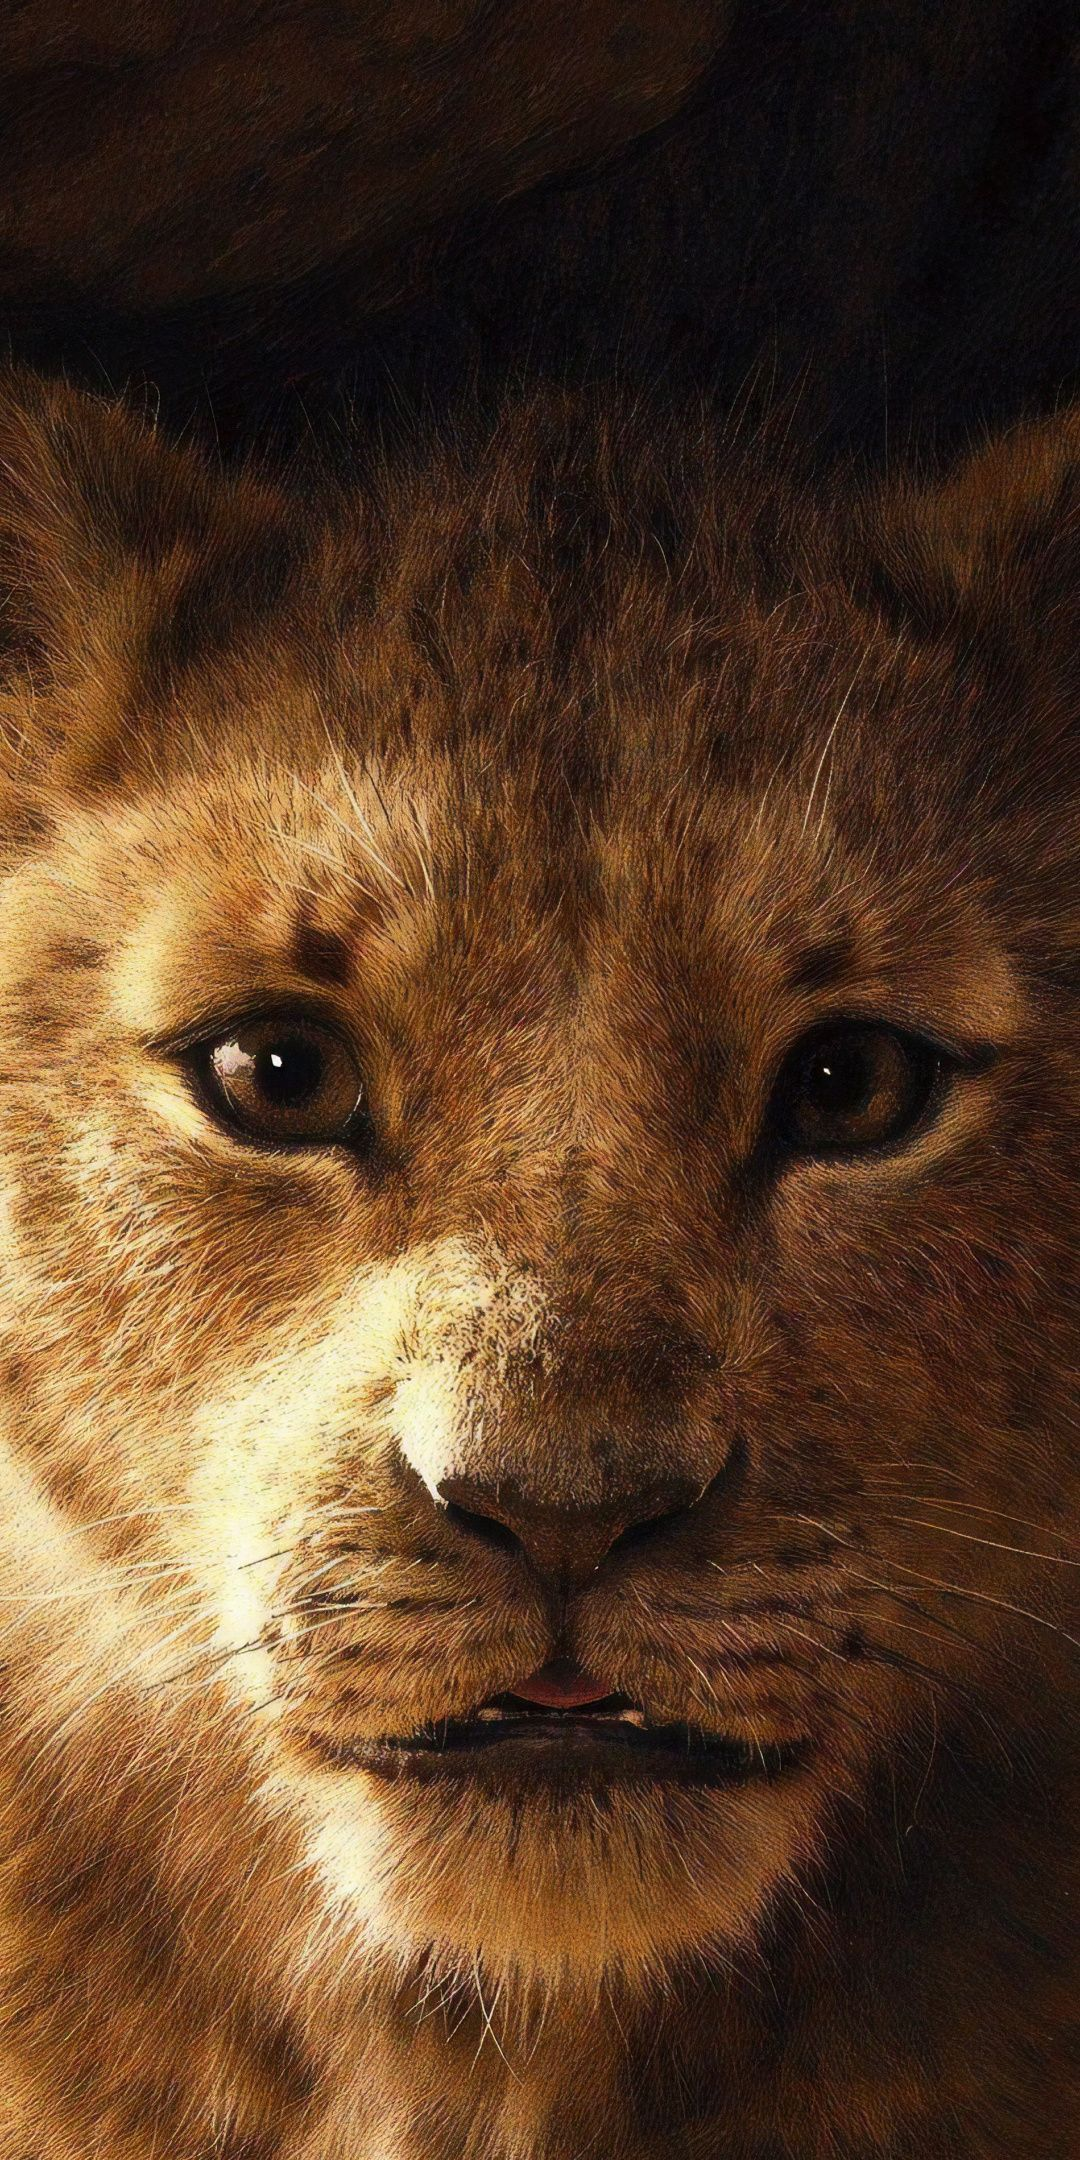 Simba The Lion King 2019 Movie 1080x2160 Wallpaper Downlod And Watch The Lion King 2019 Full Movie Onl Lion King Movie Lion King Pictures Disney Lion King